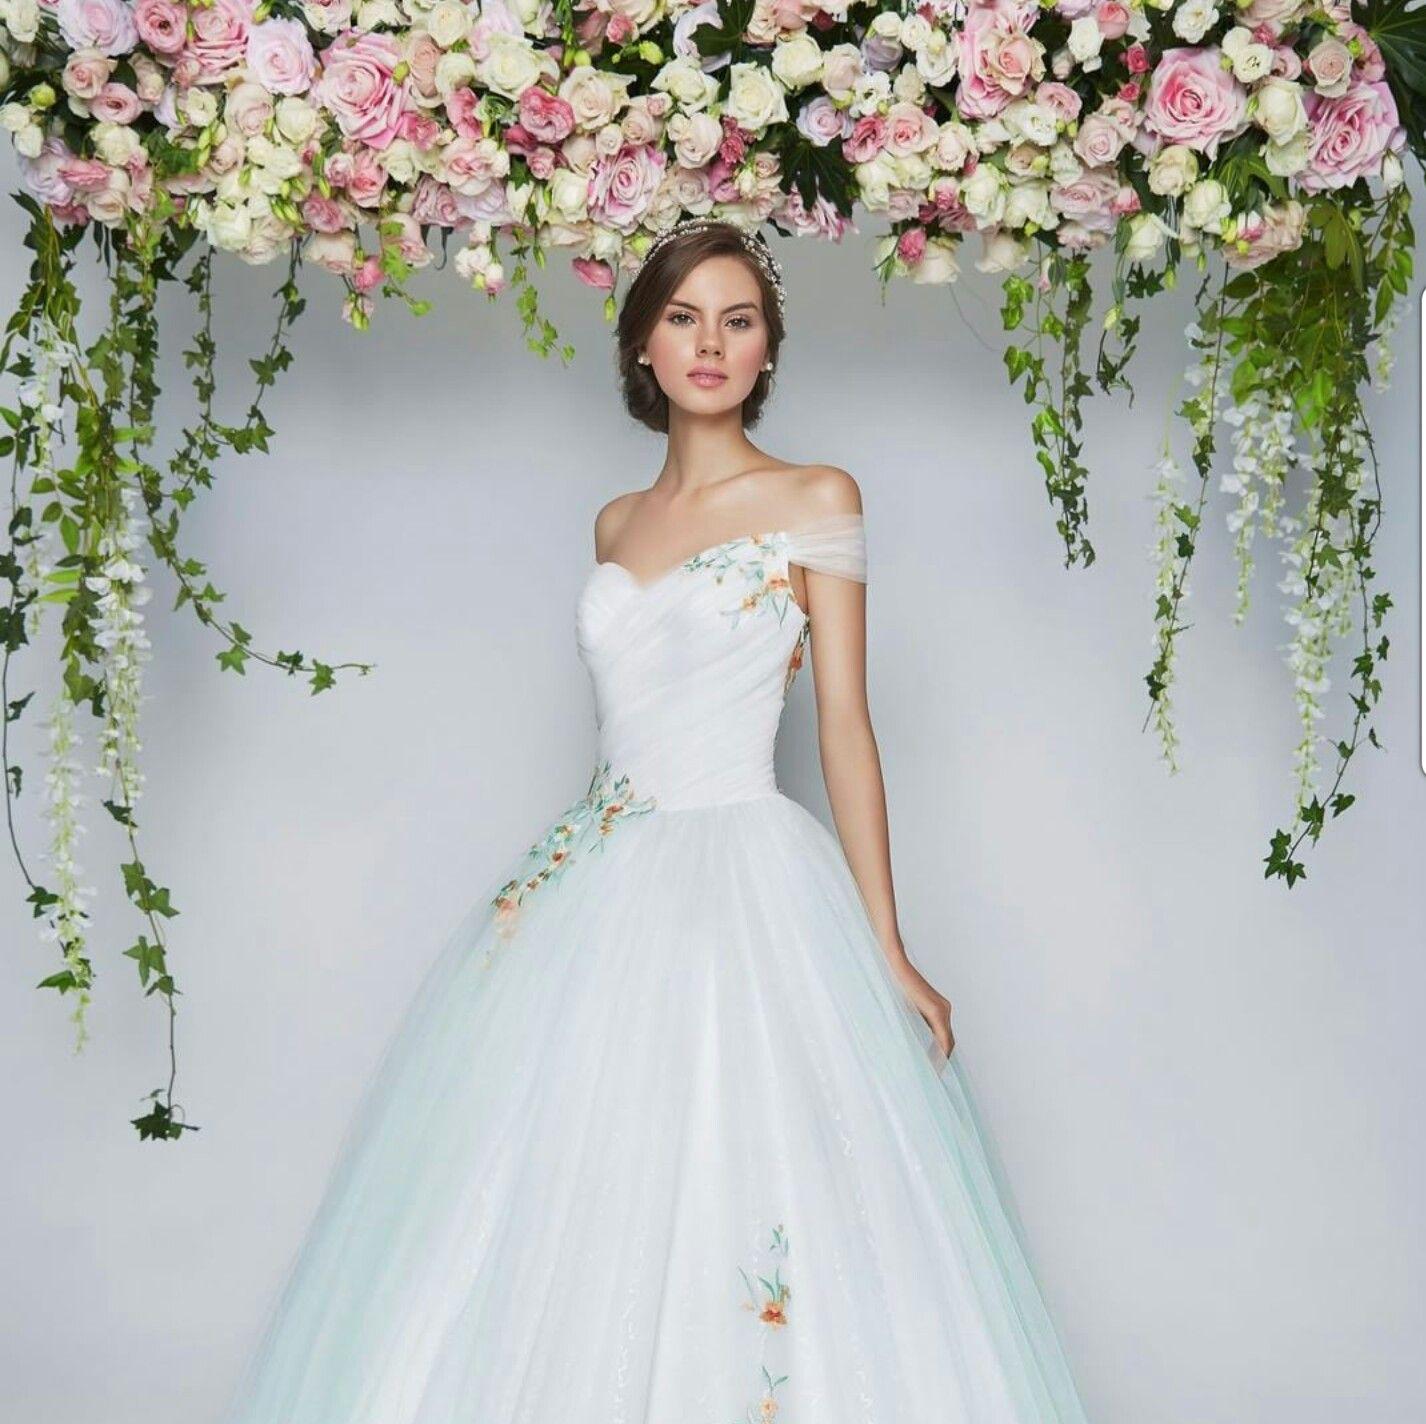 19+ Wedding dress rentals utah county ideas